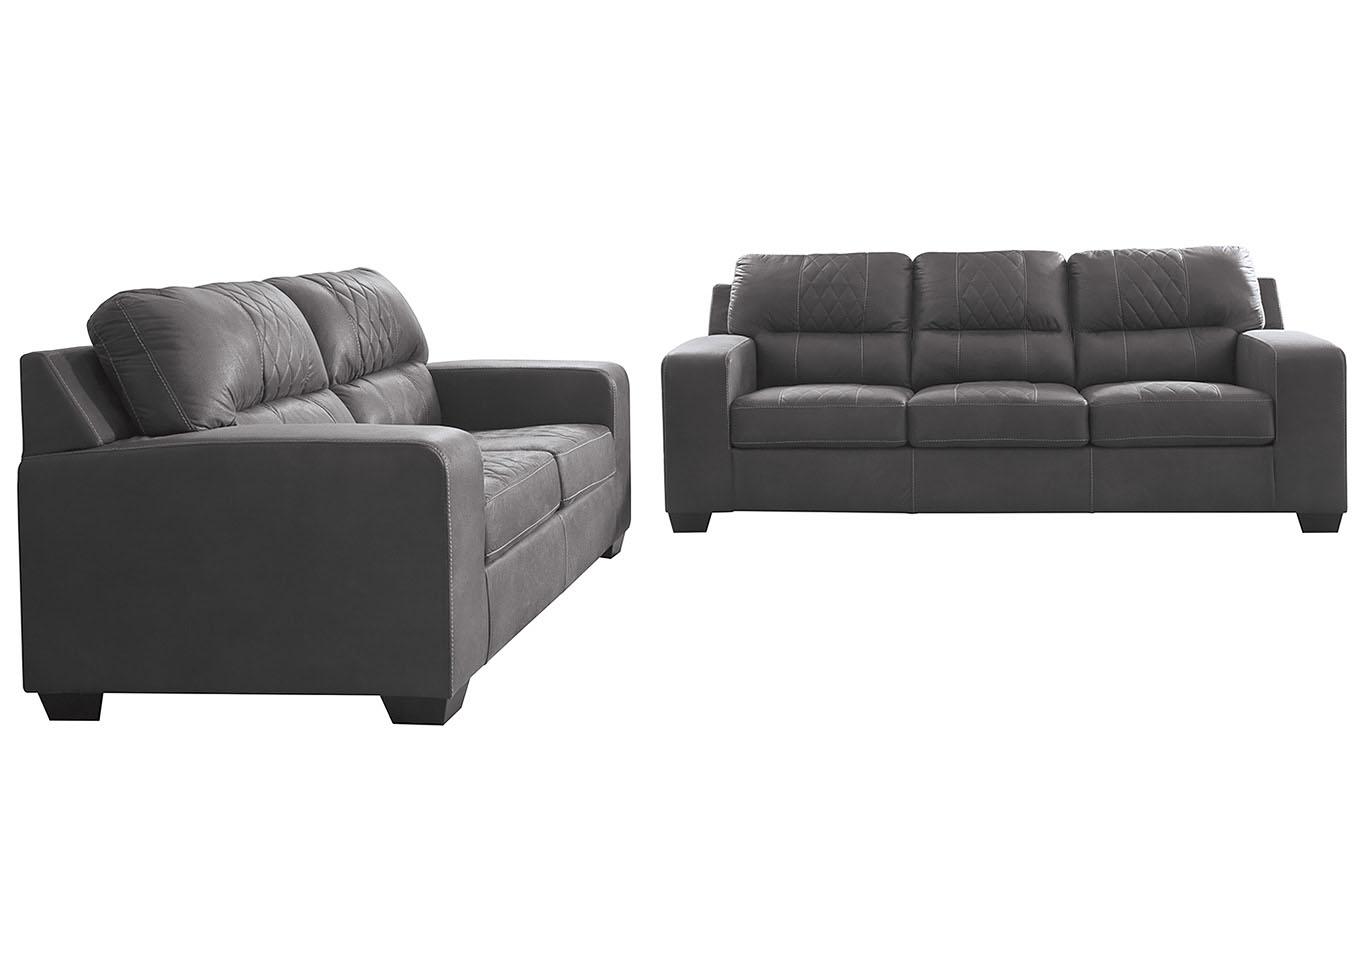 Taft Furniture Sleep Center Narzole Dark Gray Sofa Loveseat